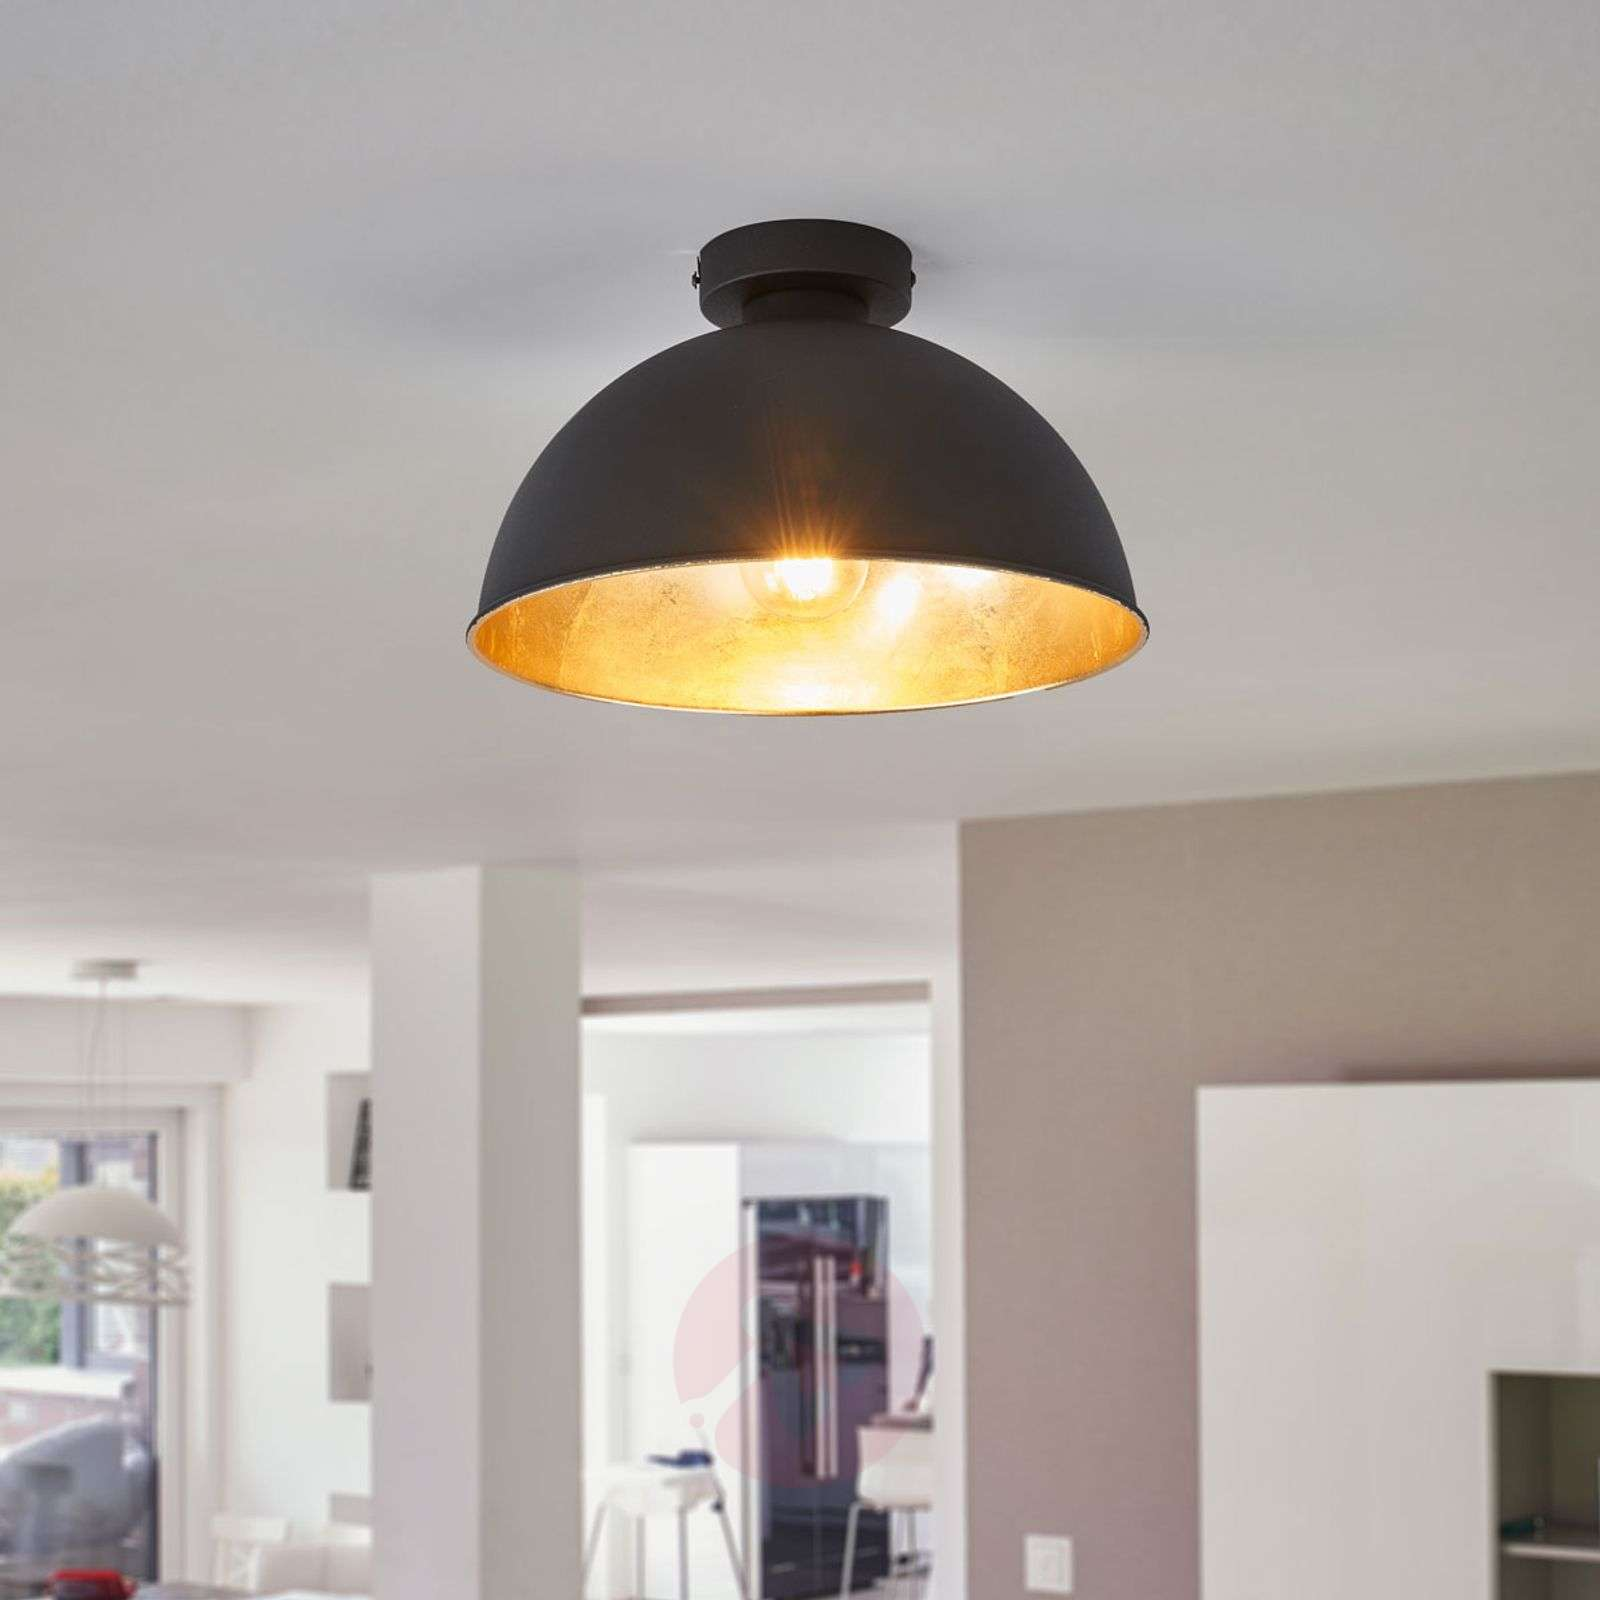 Black-gold Jimmy metal ceiling light-8029093-01